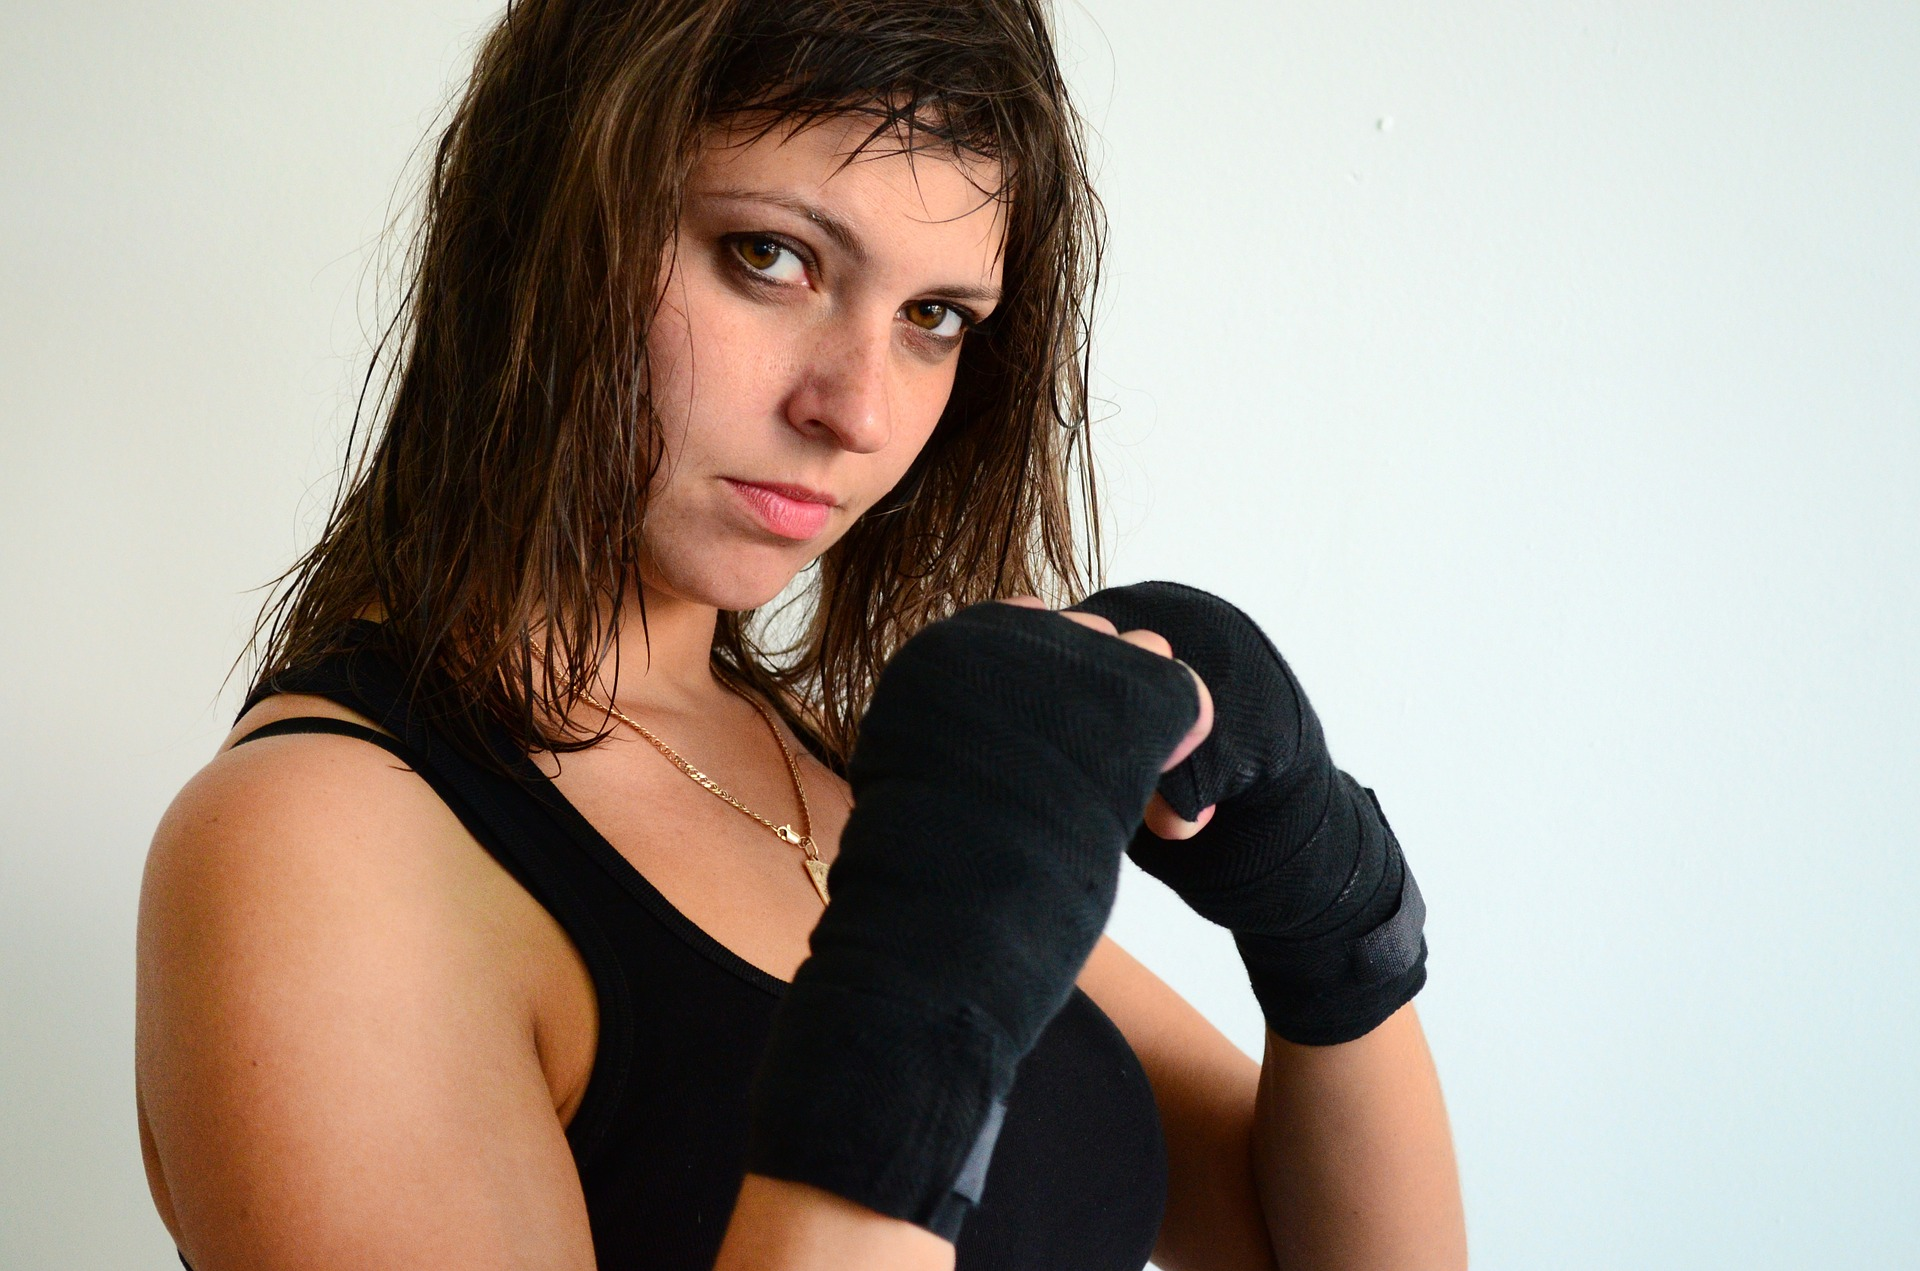 Fitness Handschuhe richtige Sportbekleidung